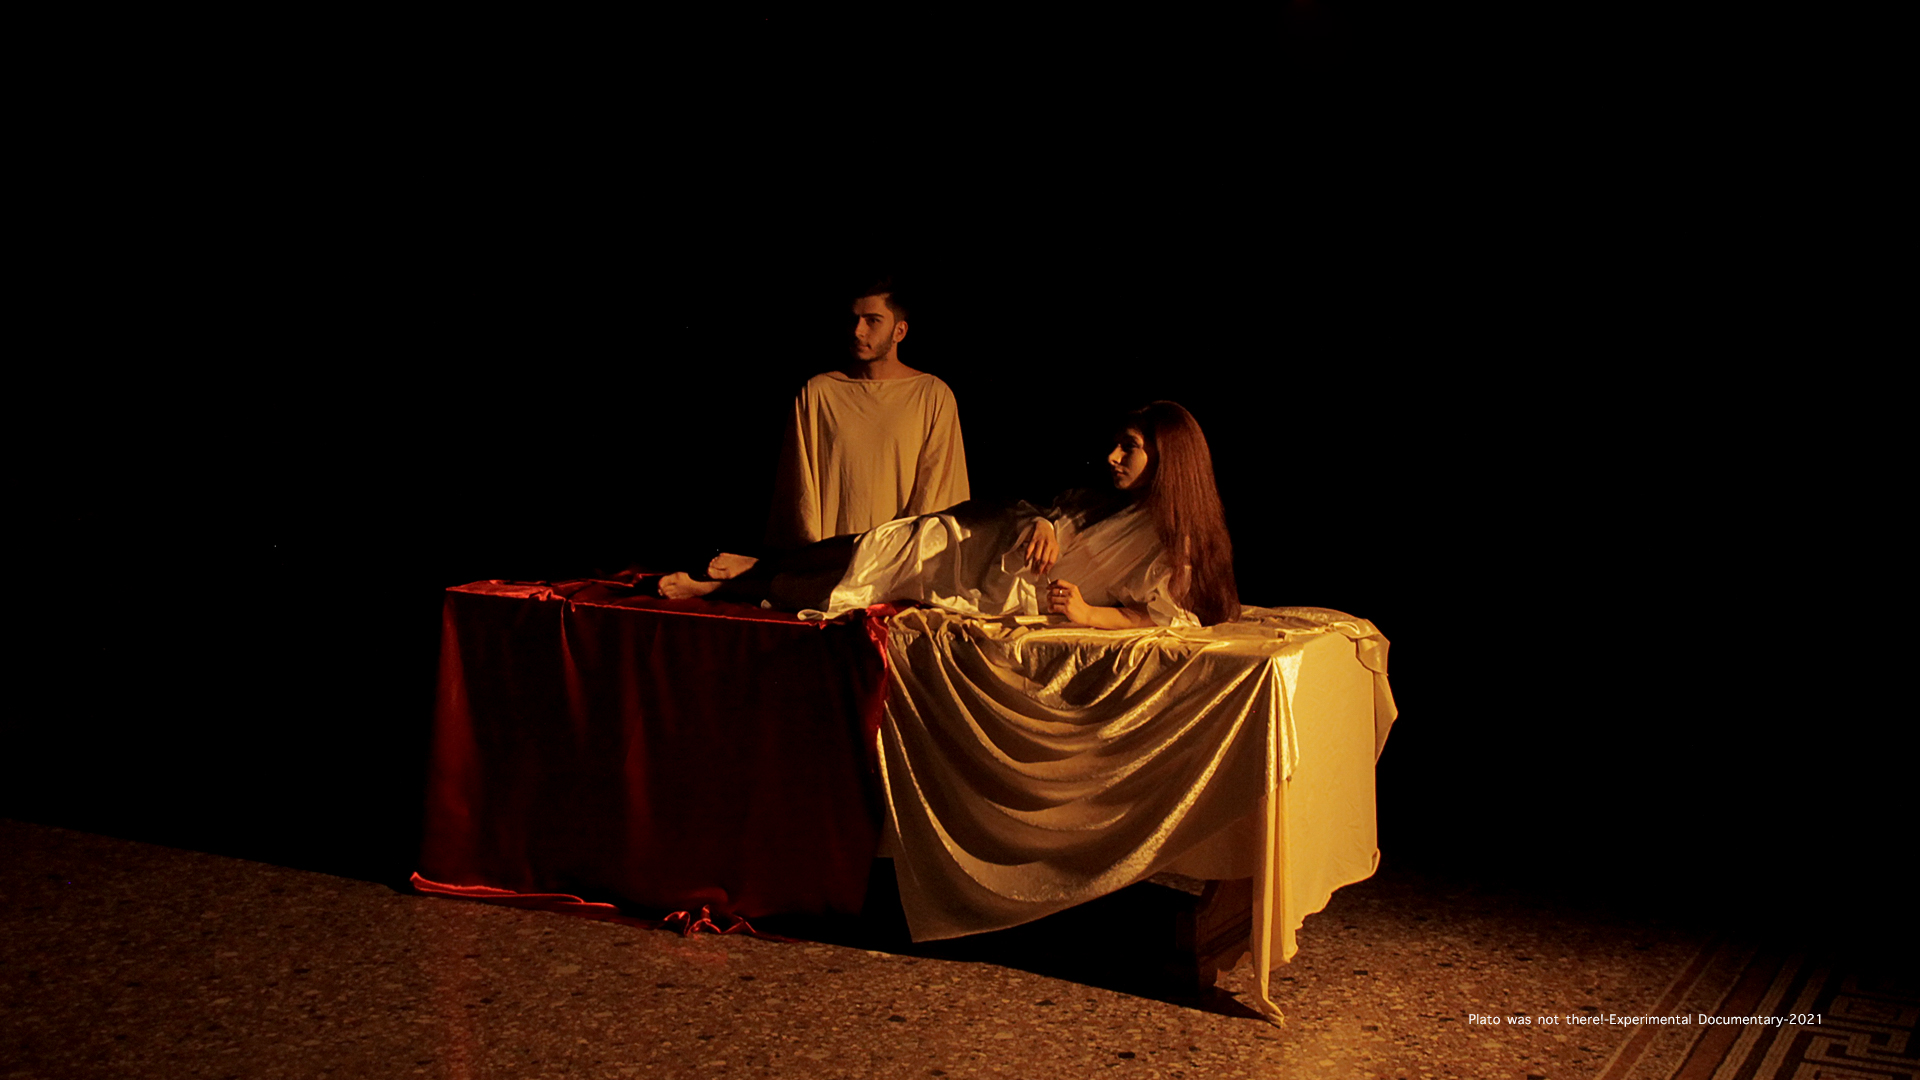 http://farhadbazyan.com/wp-content/uploads/2021/01/Plato-was-not-there-Experimental-Documentary-2021-copy.jpg